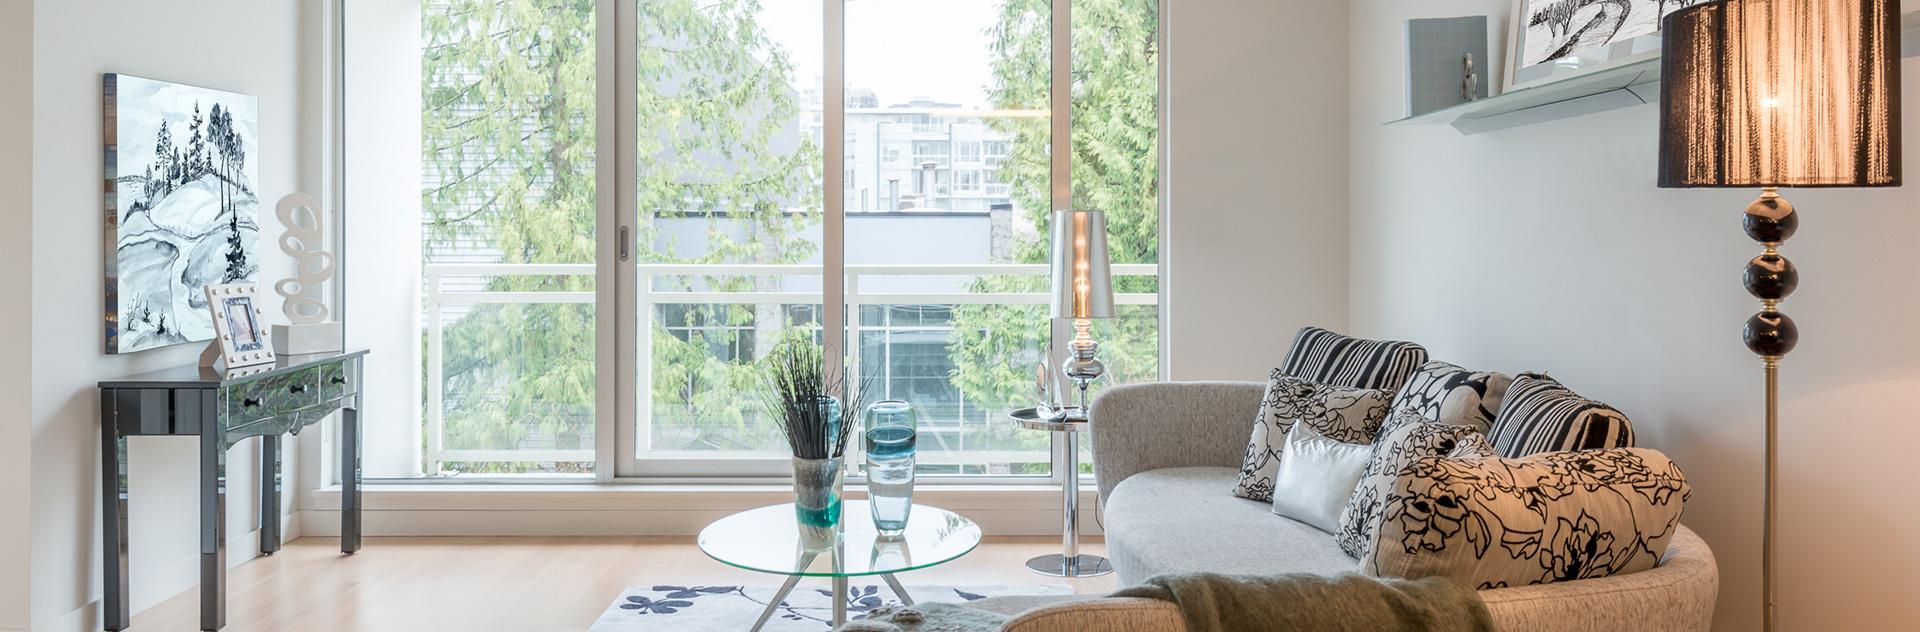 Inmobiliaria acuario en sevilla pisos venta en sevilla for Alquiler de casas en sevilla centro